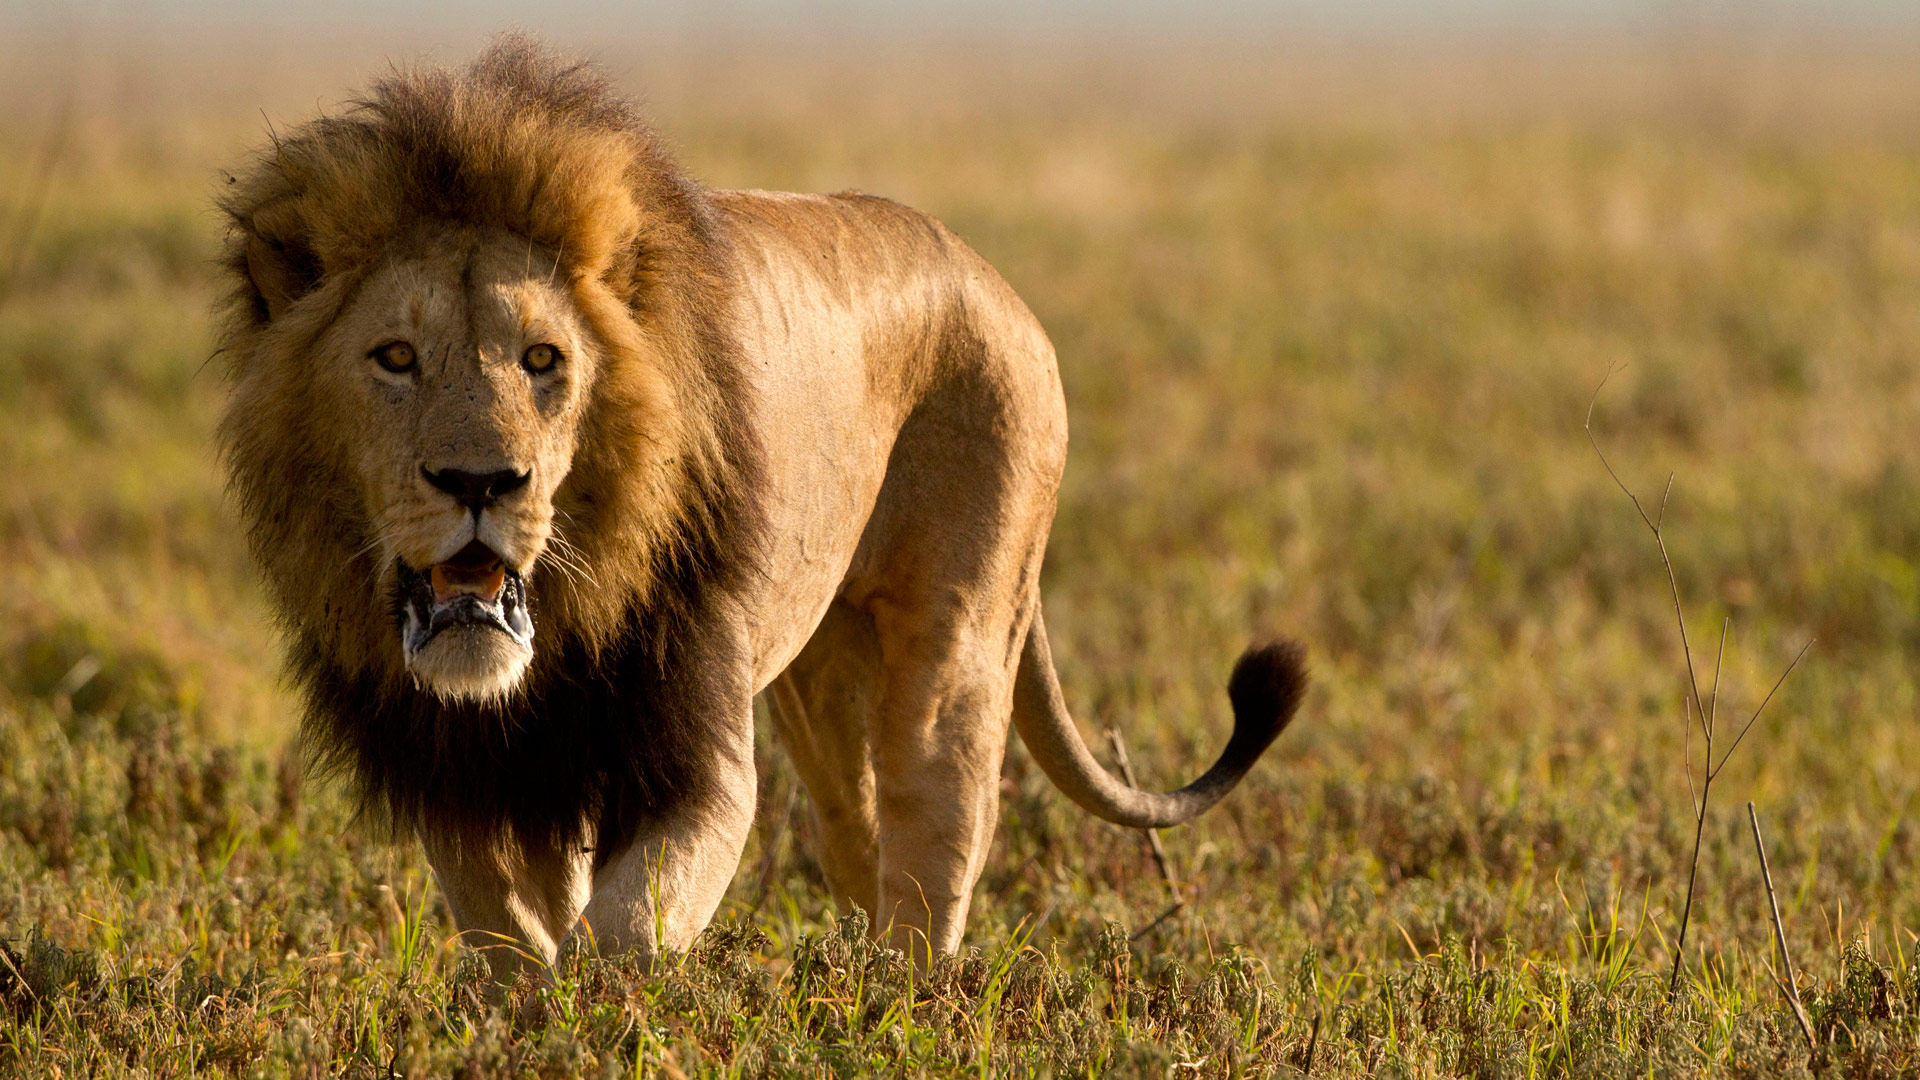 Male lion hunting in the Serengeti, Tanzania.